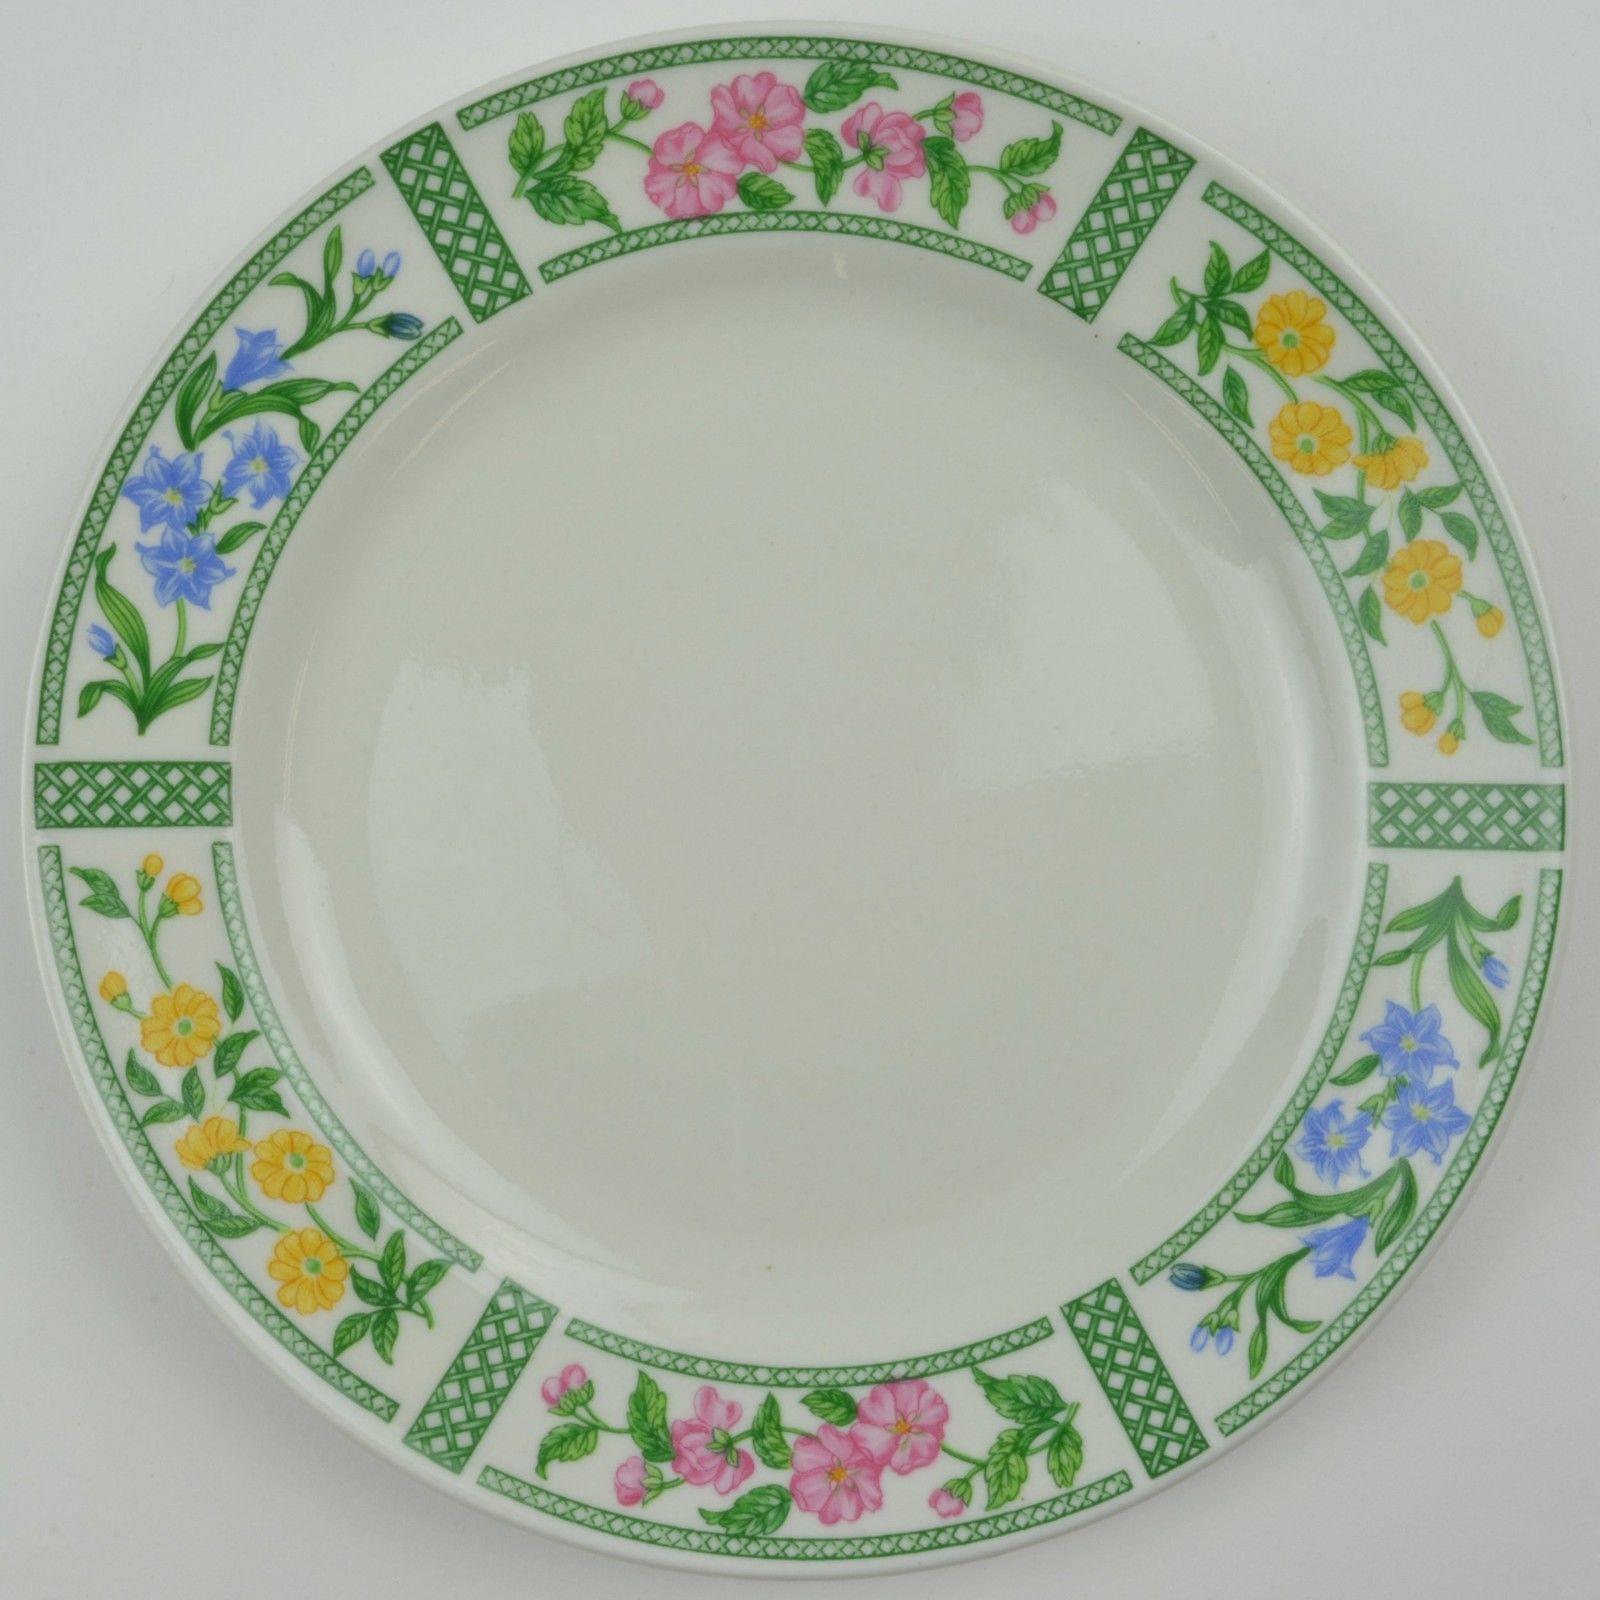 Farberware Botanica 3059 Salad Plate Stoneware China Floral Flower Lattice Green - $8.99